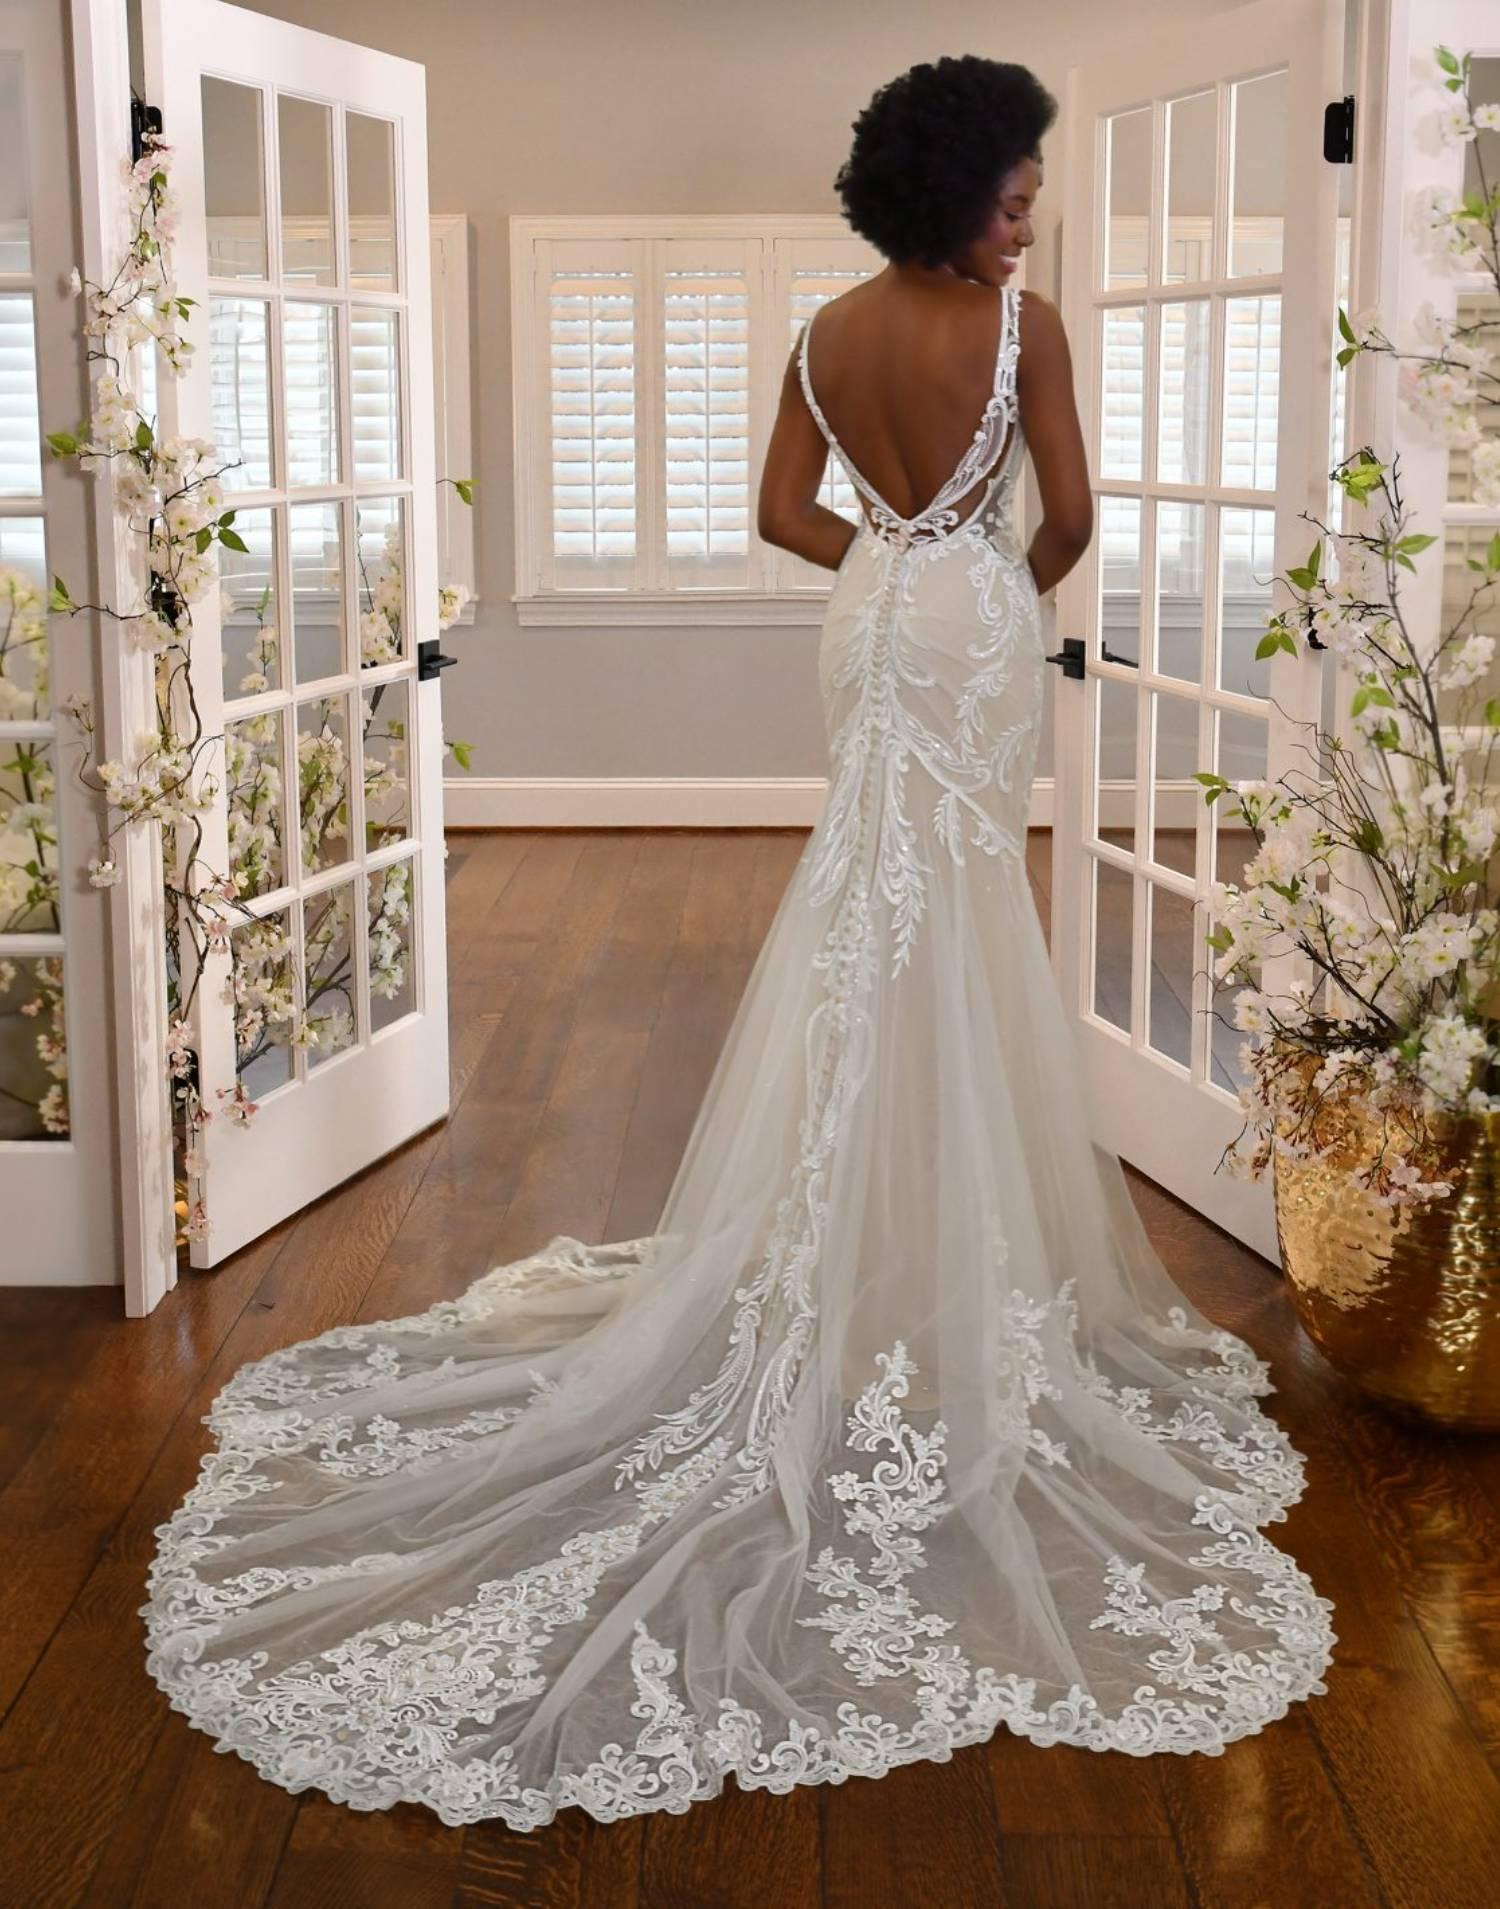 D3153-wedding-dress-Essense-of-Australia-additional-view-product-min